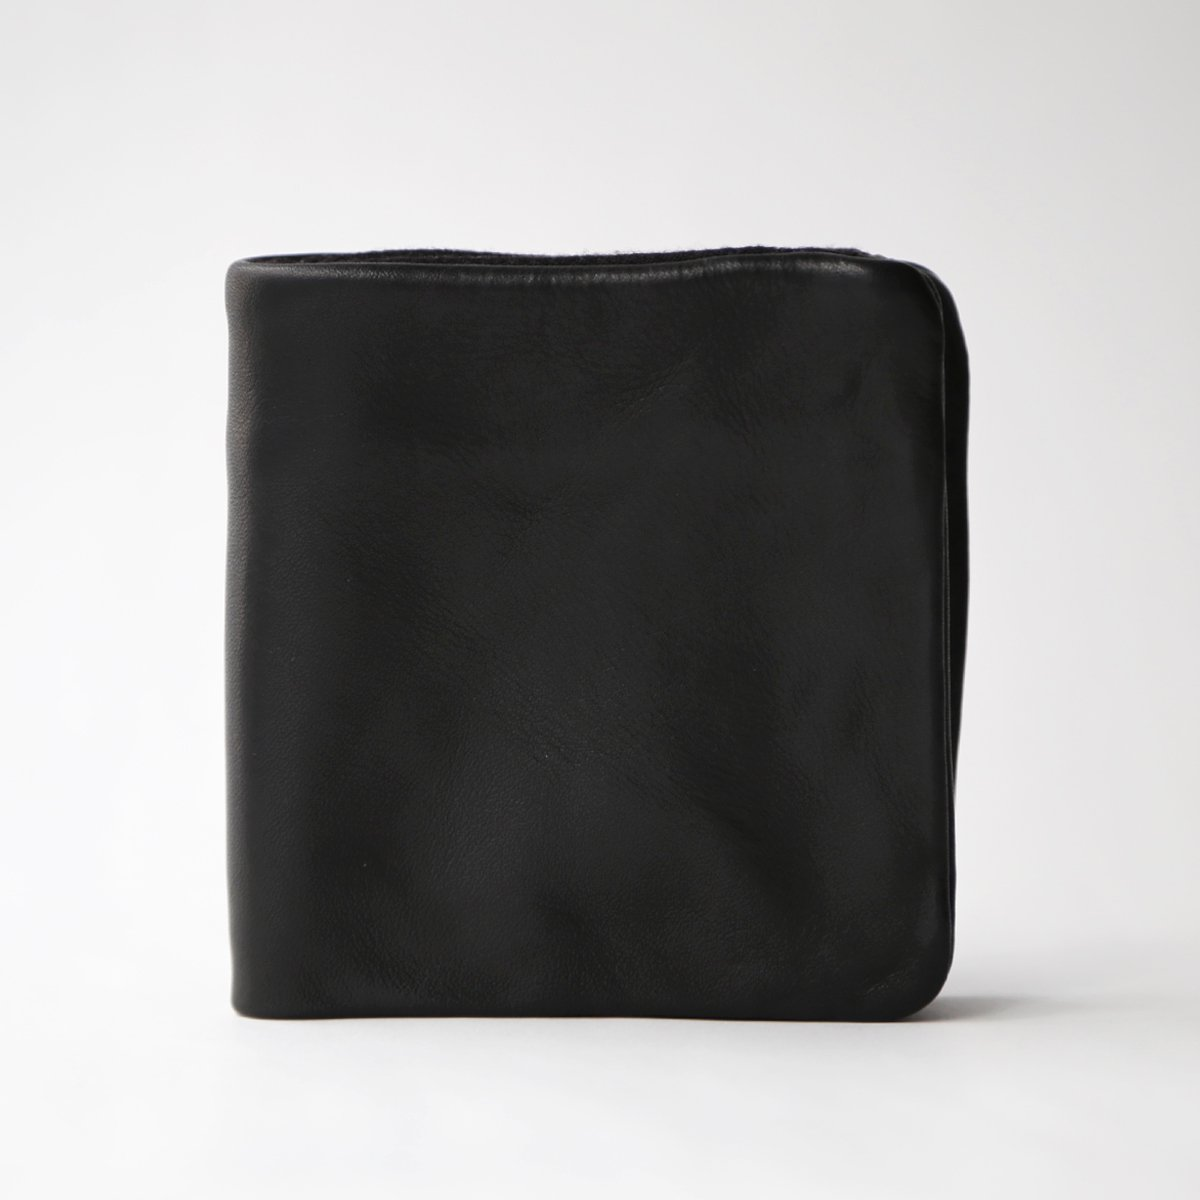 Tochca Aimer 内縫い折り財布  Black